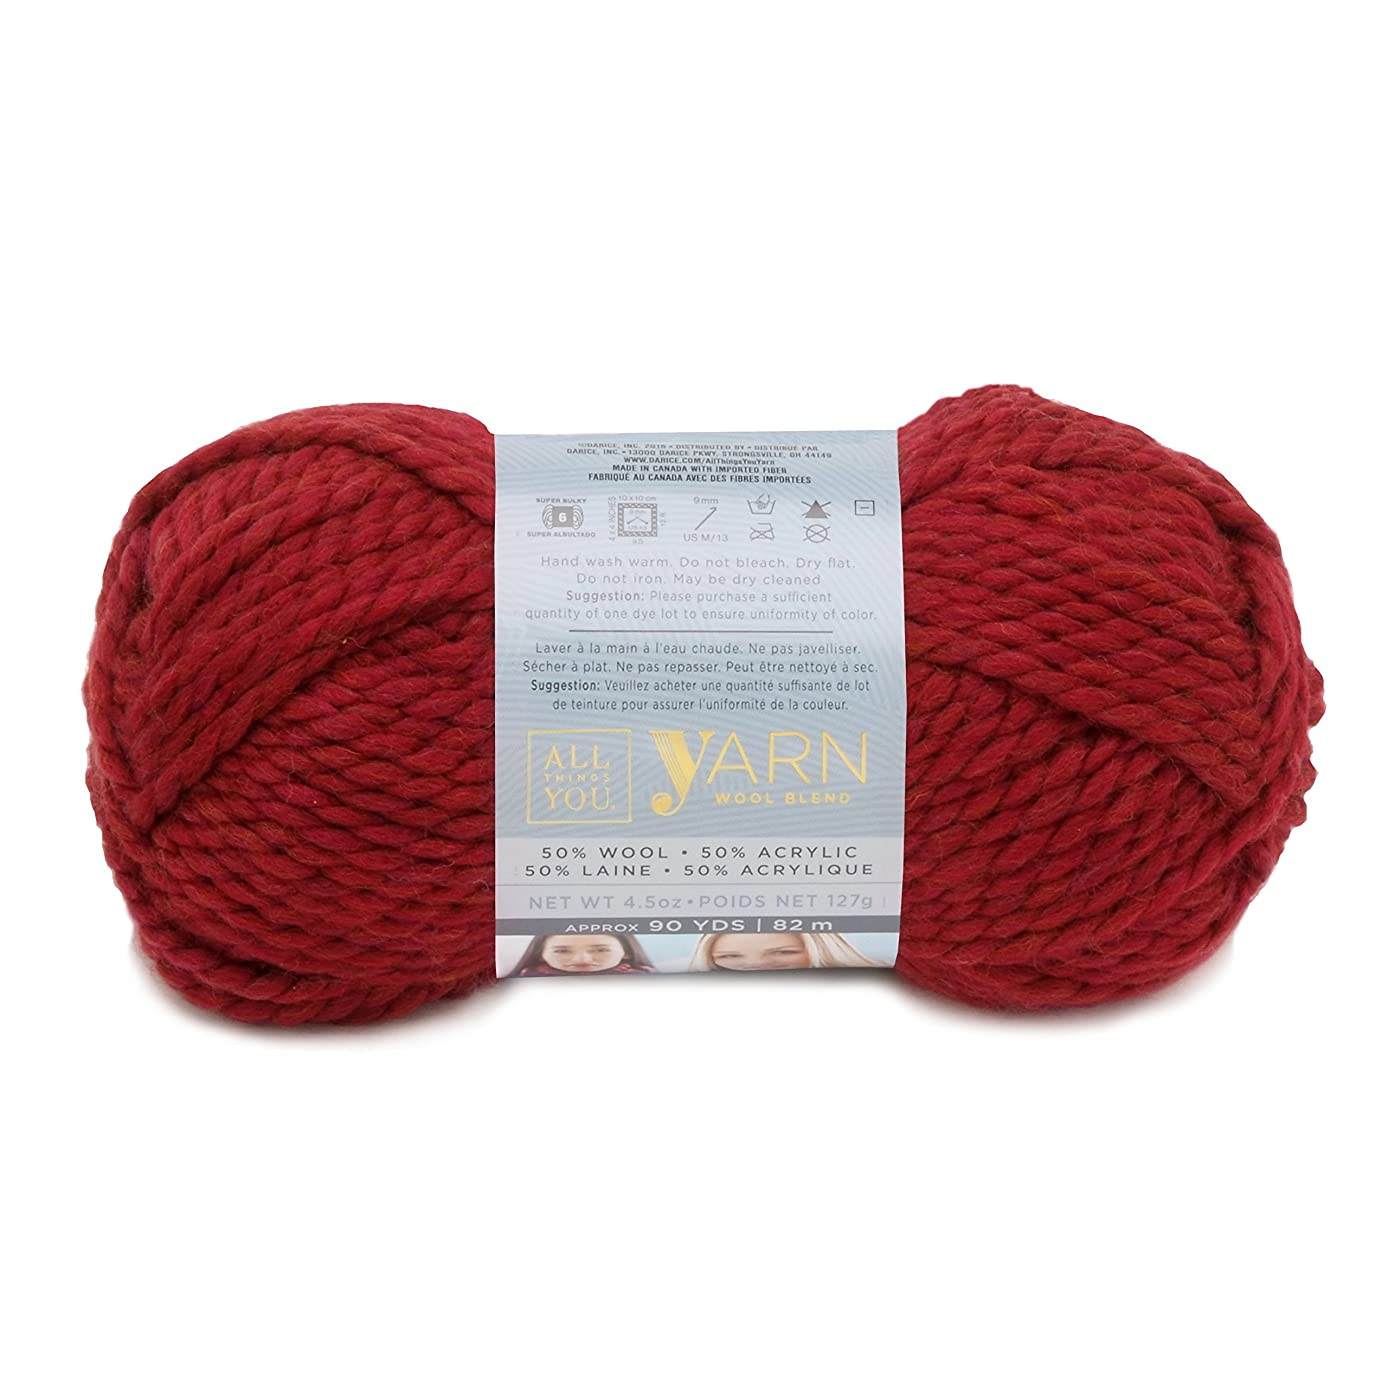 Darice All Things You, Wool and Acylic Blend Yarn, Merlot